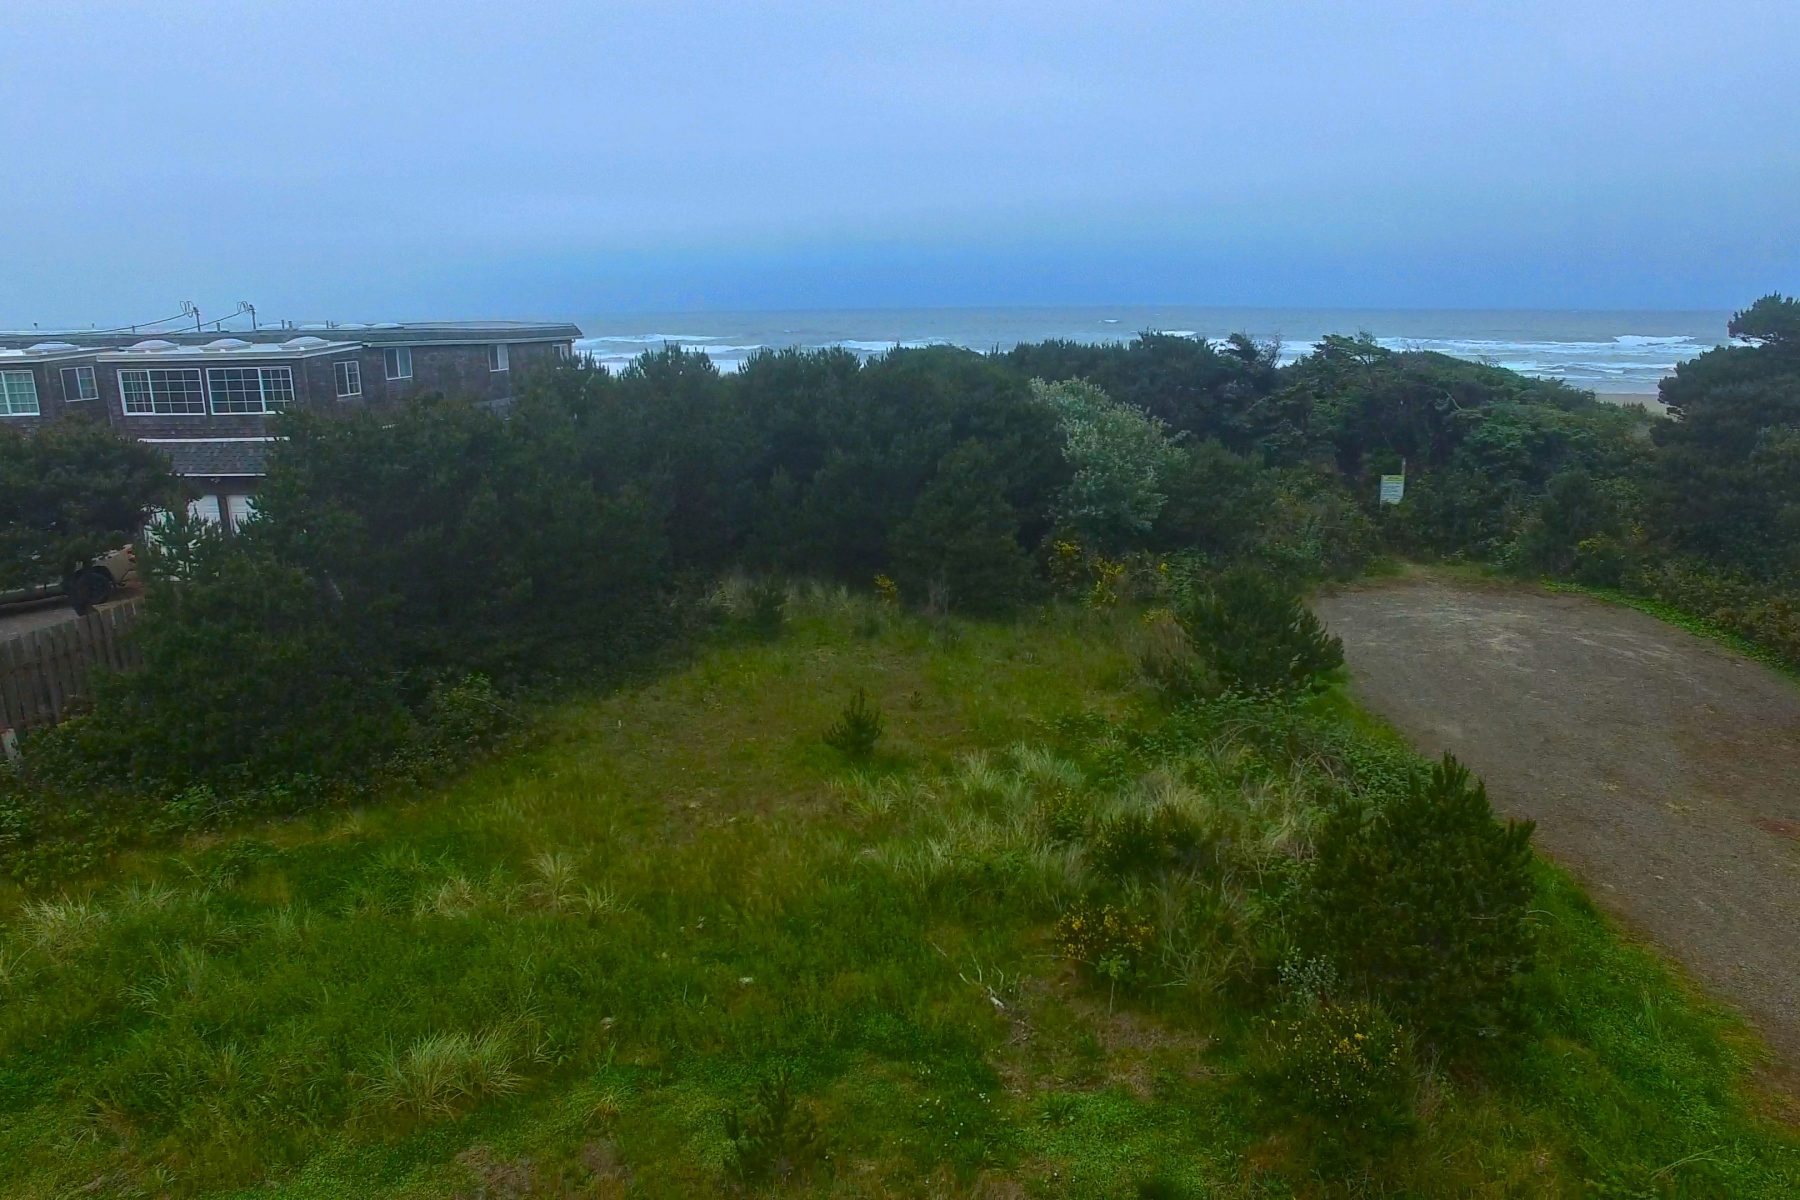 Đất đai vì Bán tại 150 NW 23RD AVE, ROCKAWAY BEACH Rockaway Beach, Oregon, 97136 Hoa Kỳ